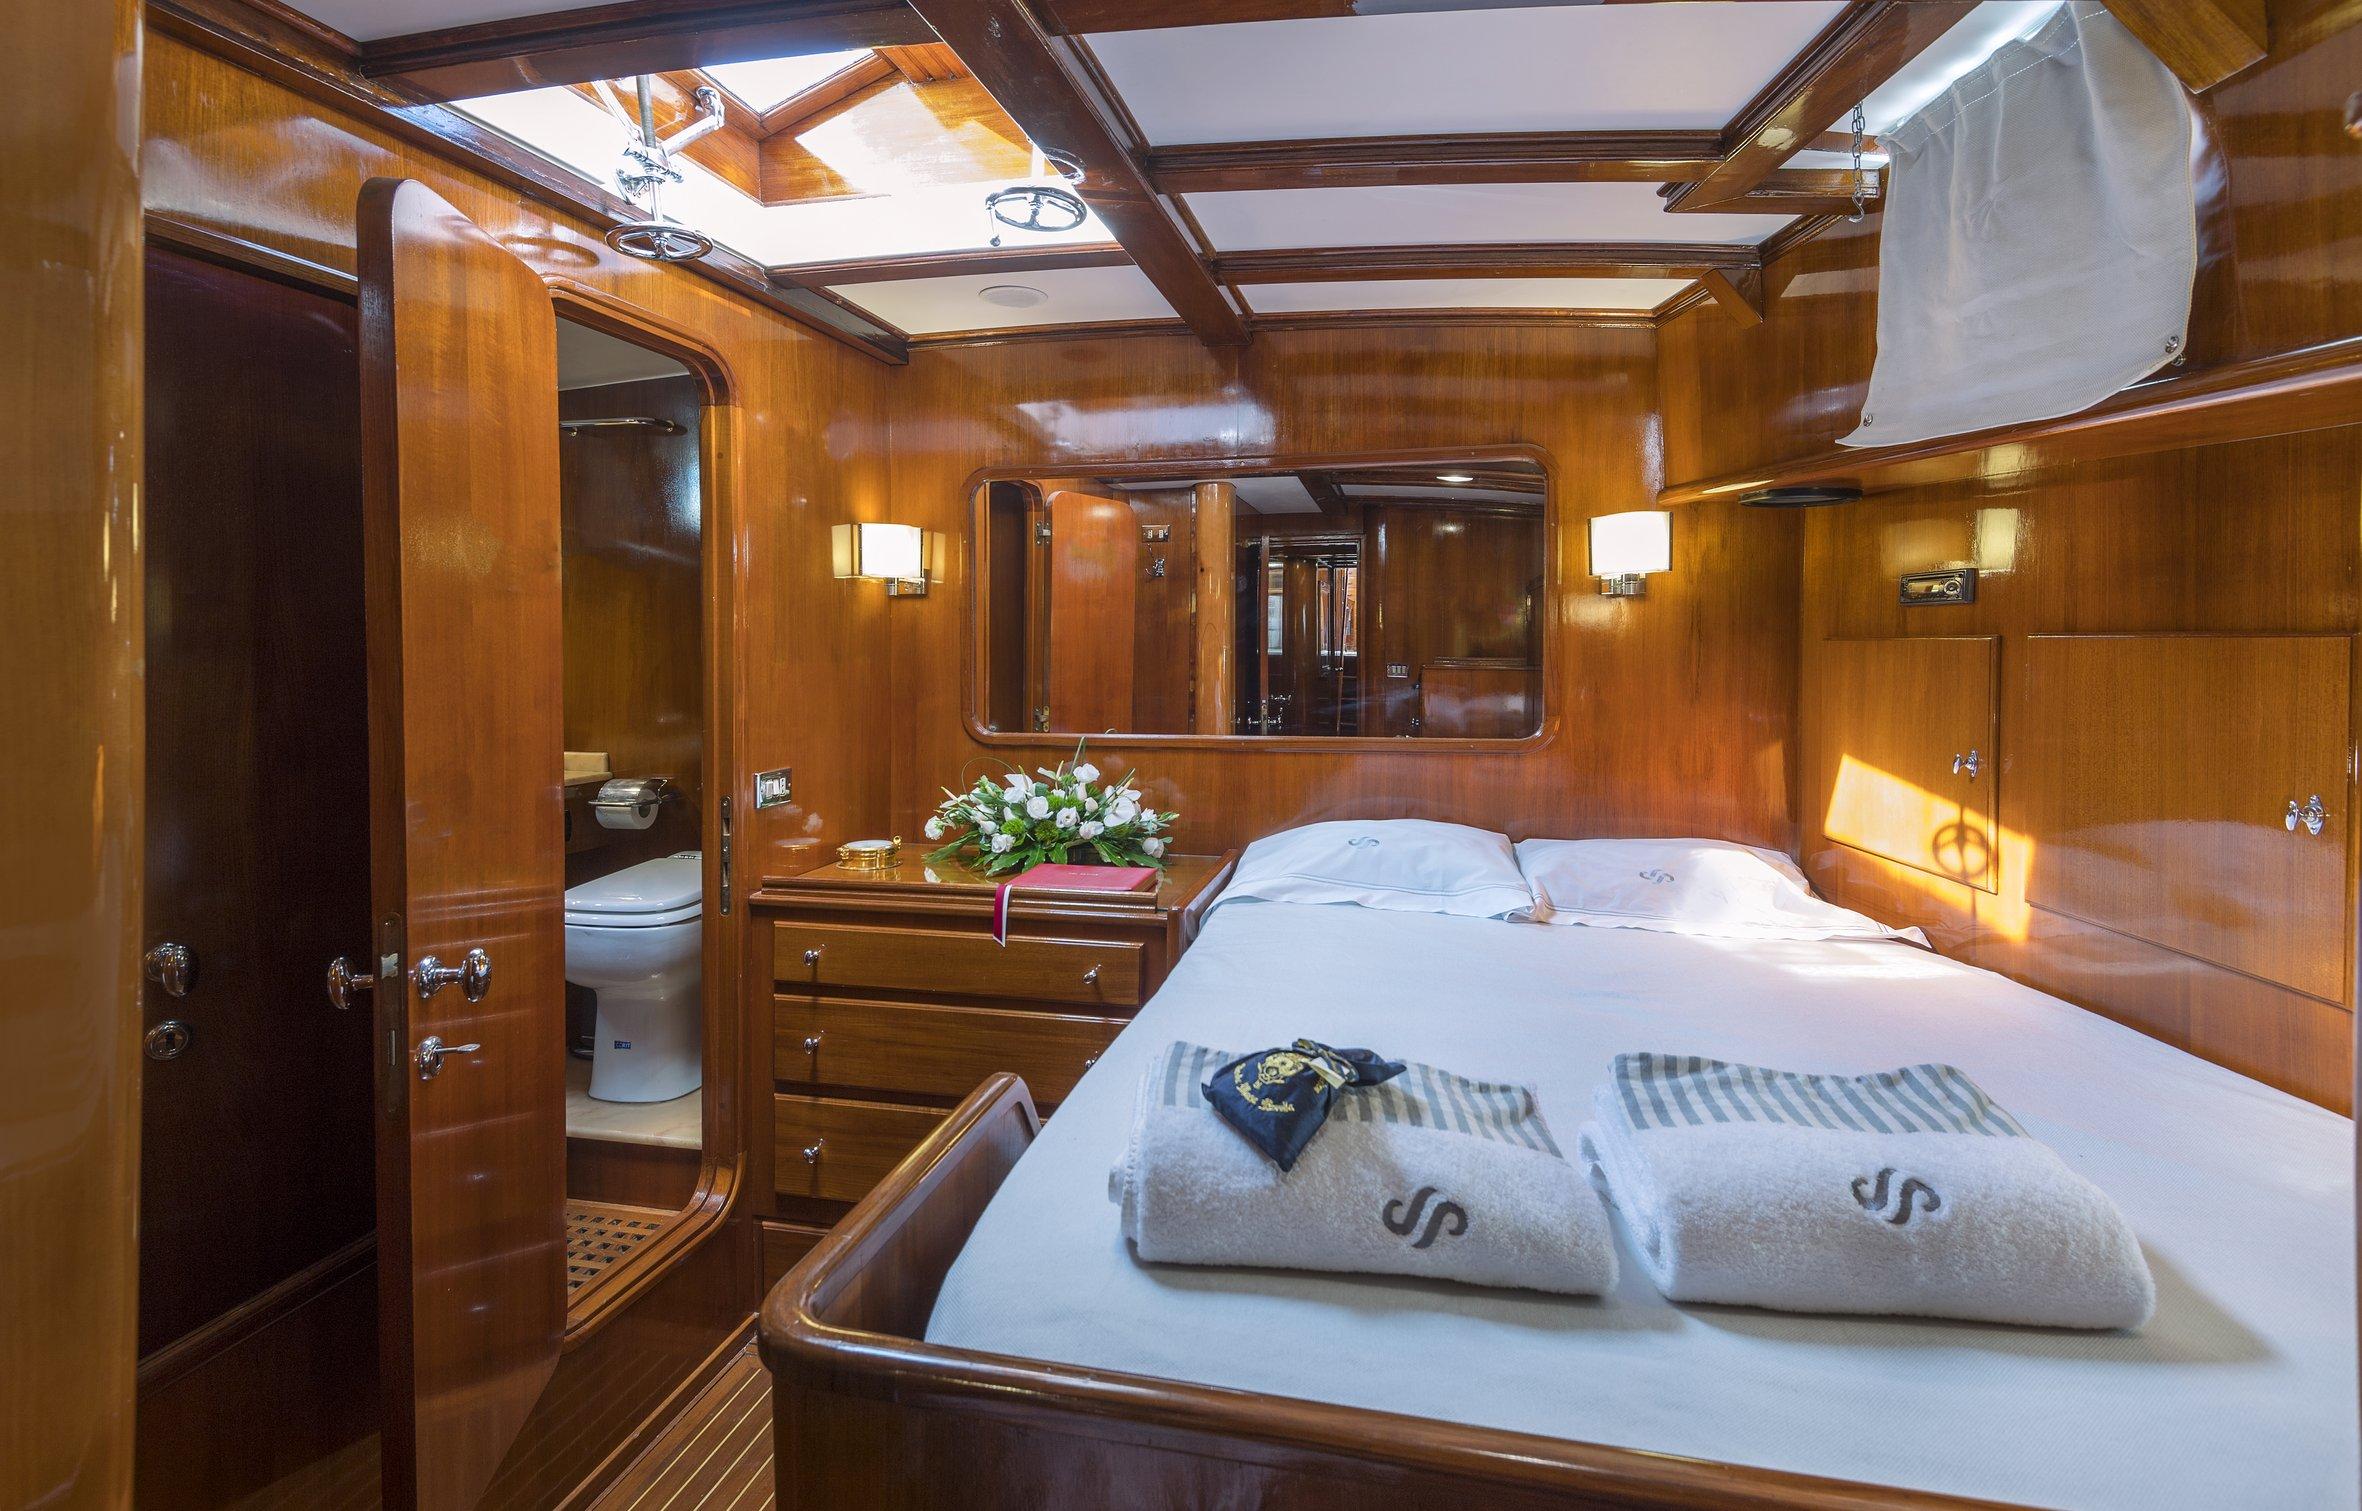 seaprince_cabin140_phBluePassion.jpg